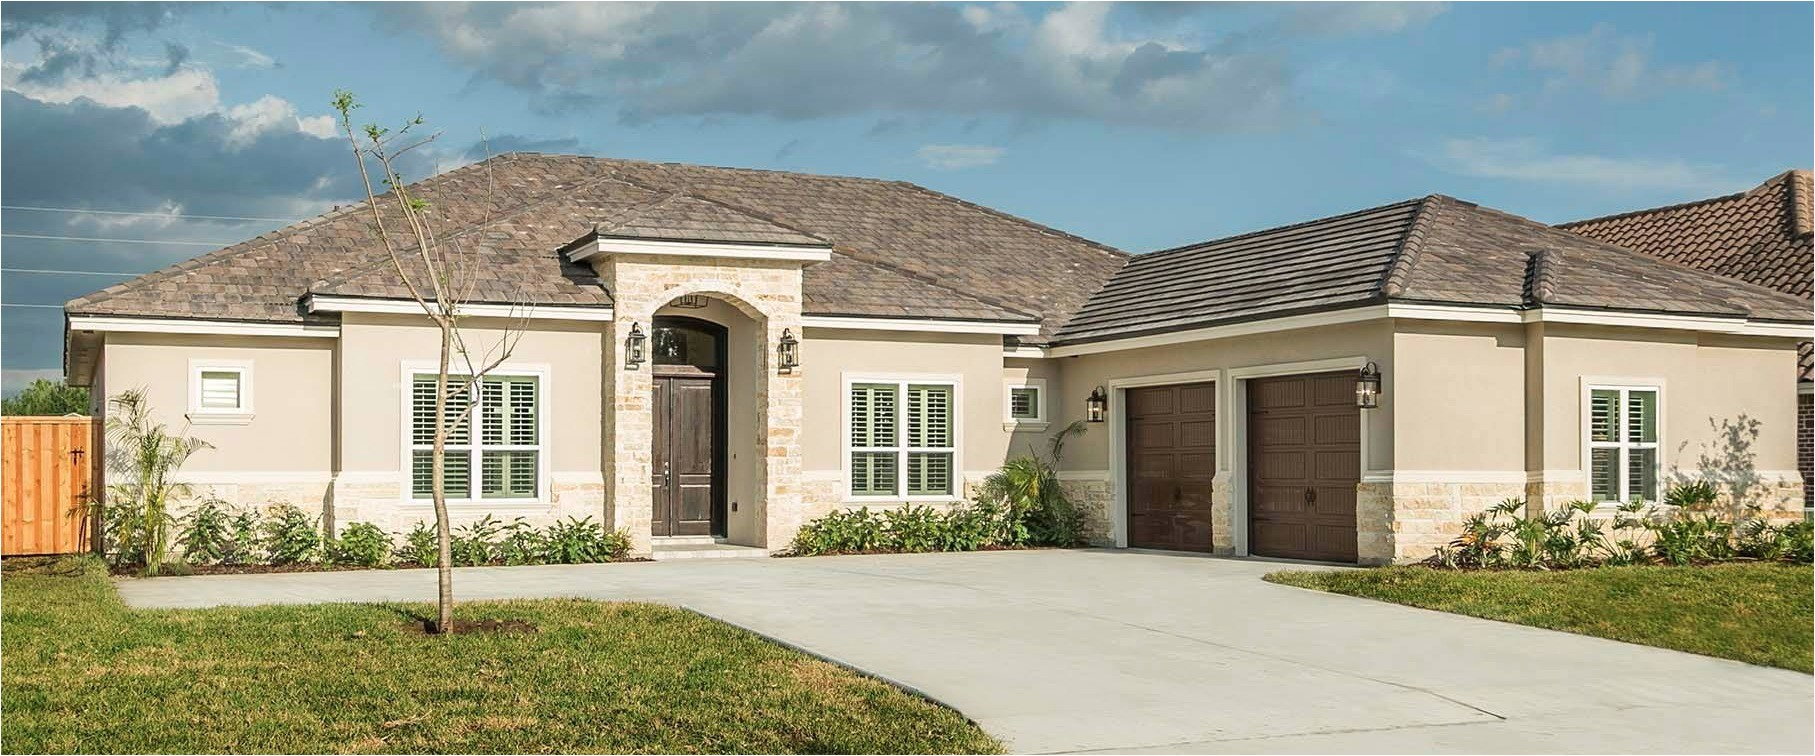 House Plans Mcallen Tx Houses Mcallen Tx House Plan 2017